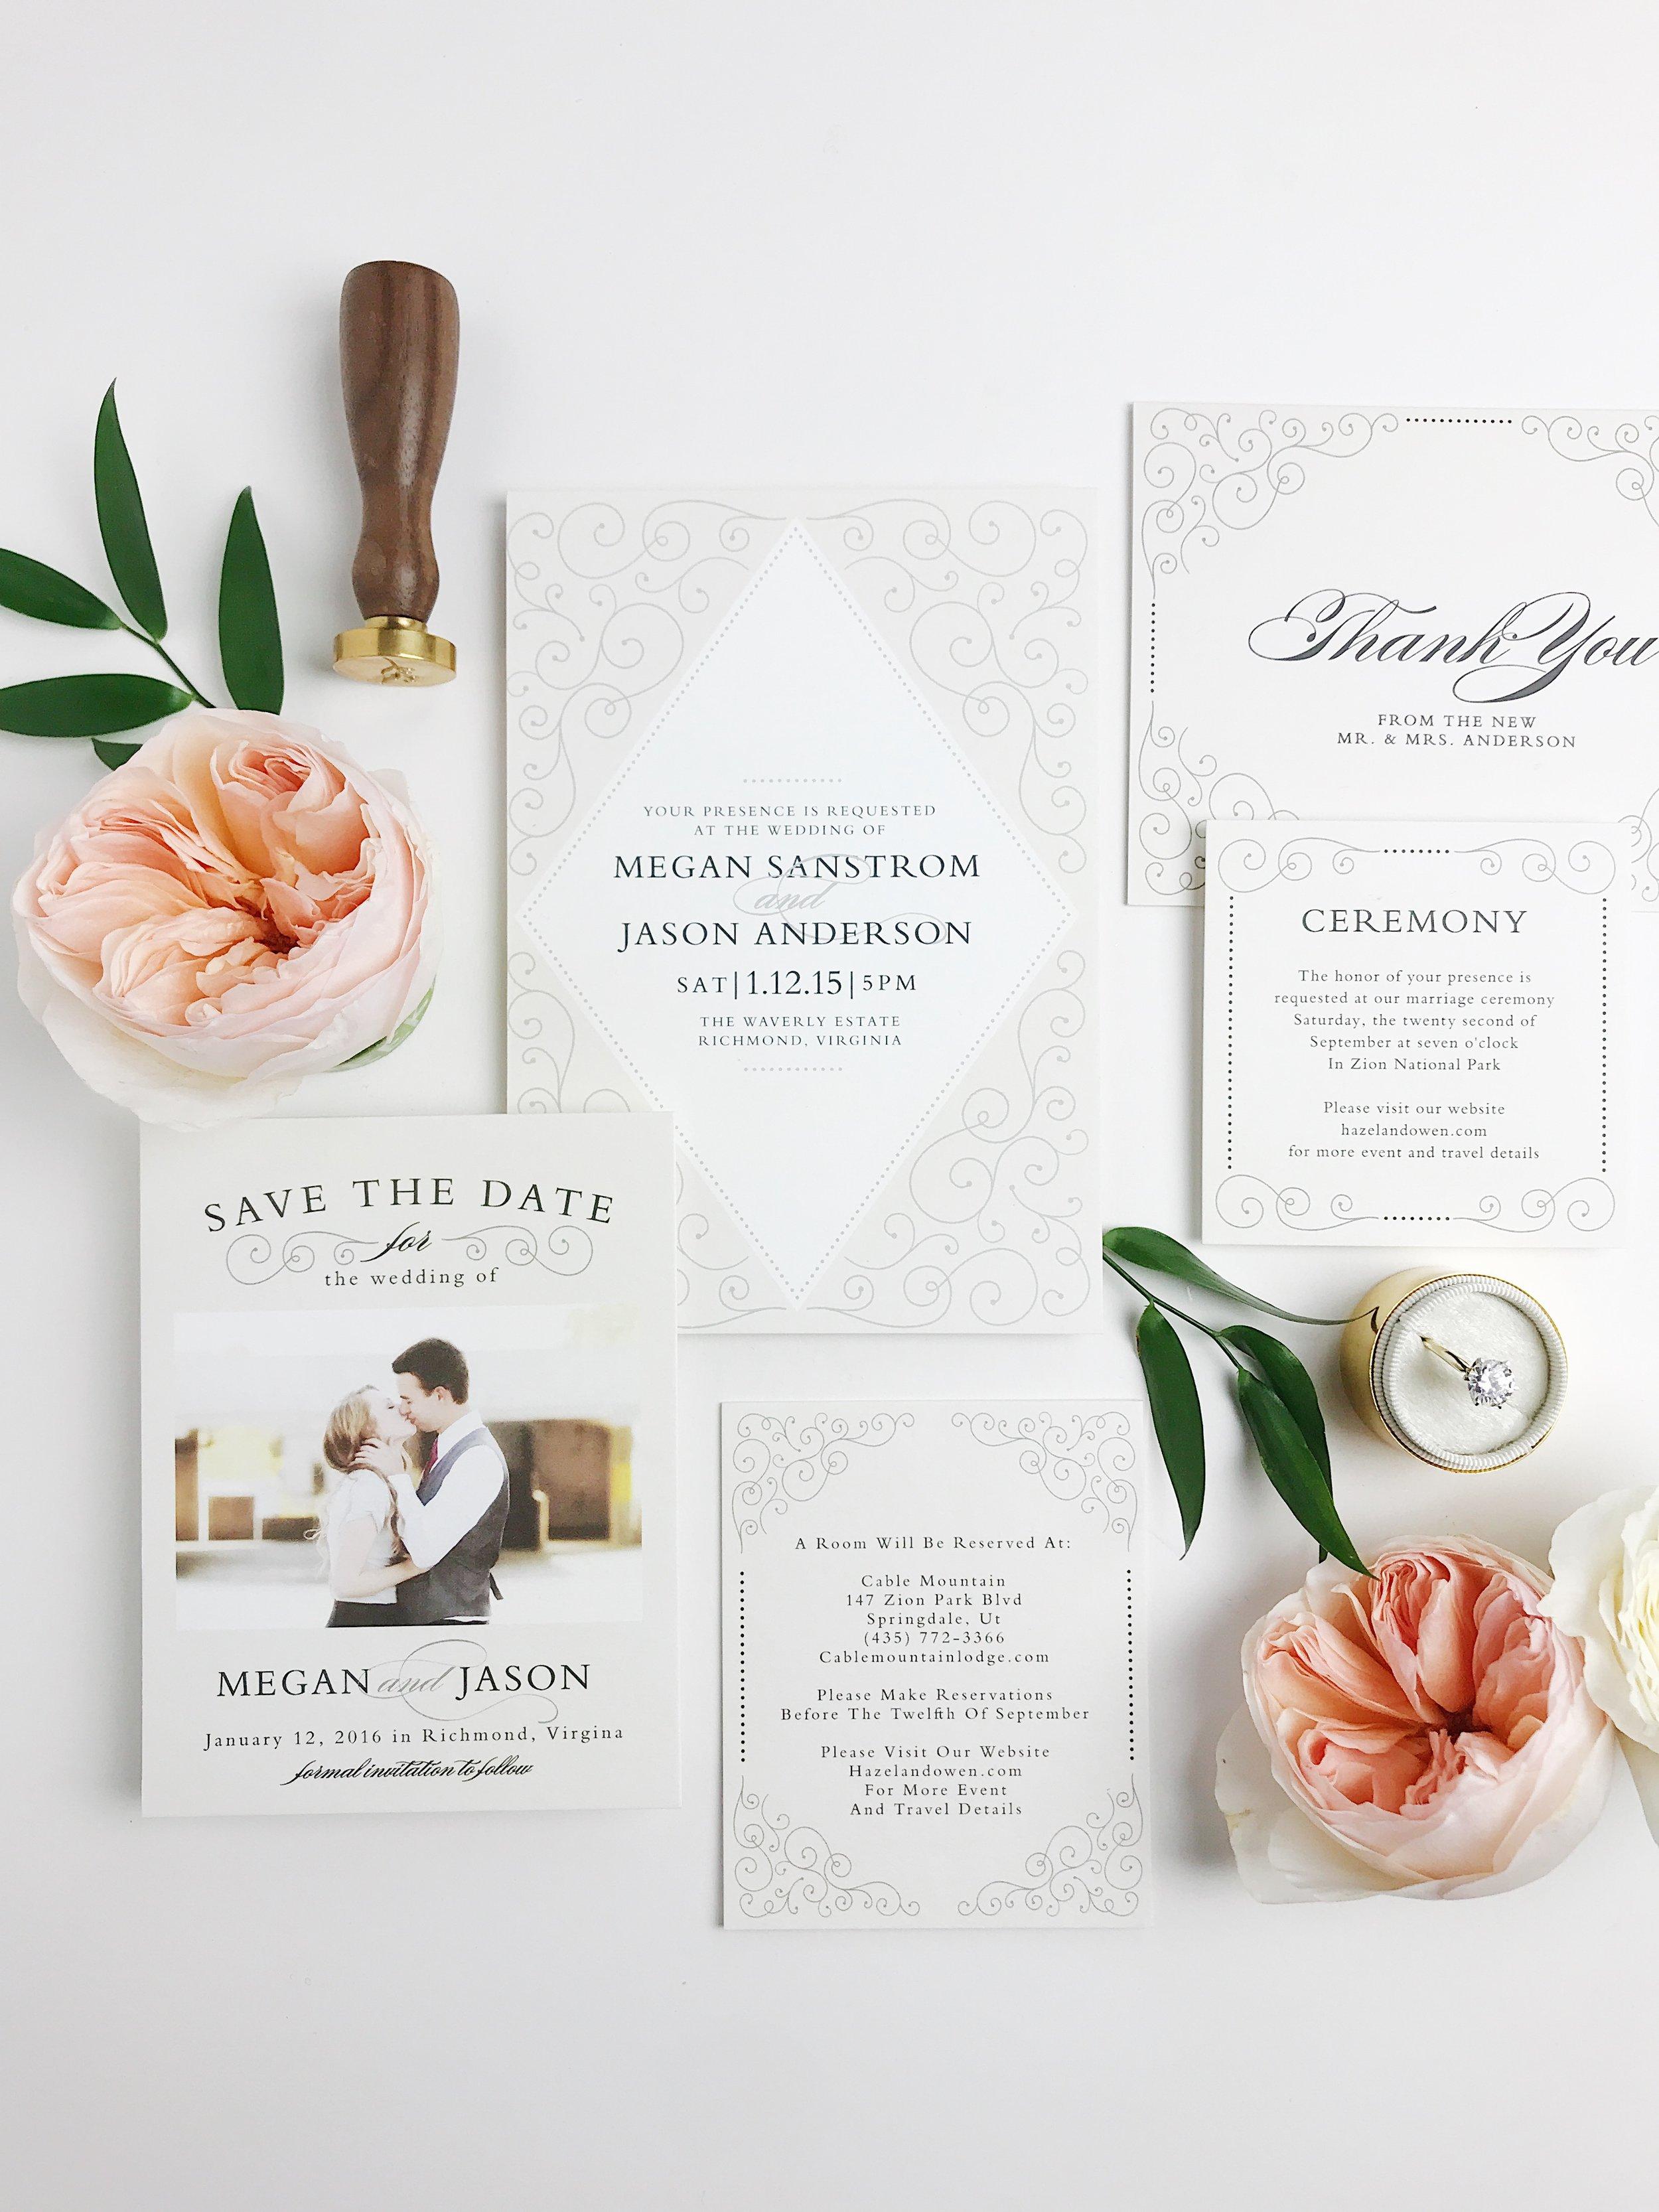 Basic_Invite_Spring_Wedding_9.jpg